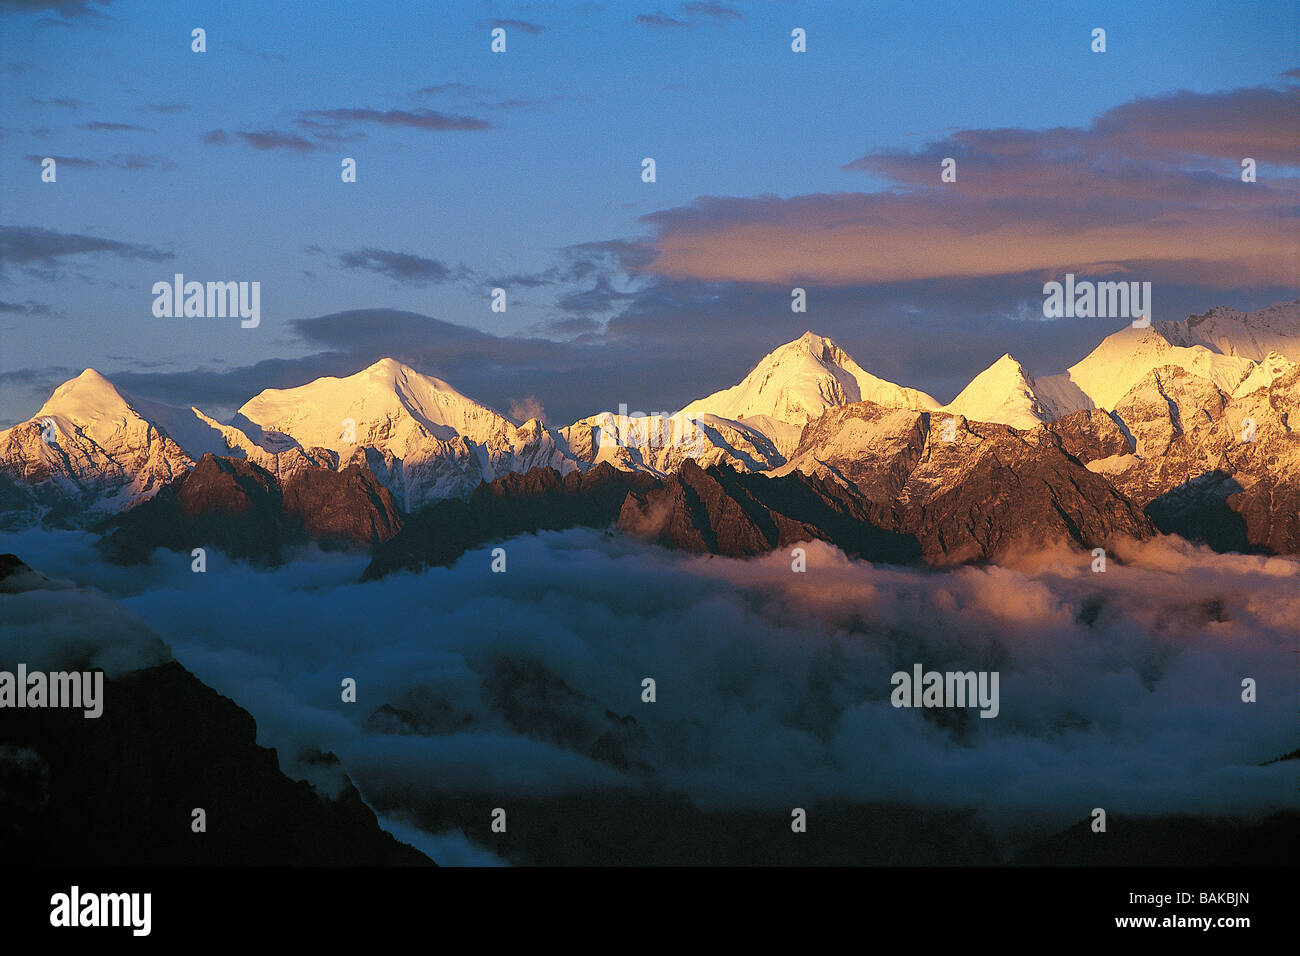 Estado de Uttarakhand, India, Himalaya, amanecer en las montañas Chaukhamba Imagen De Stock